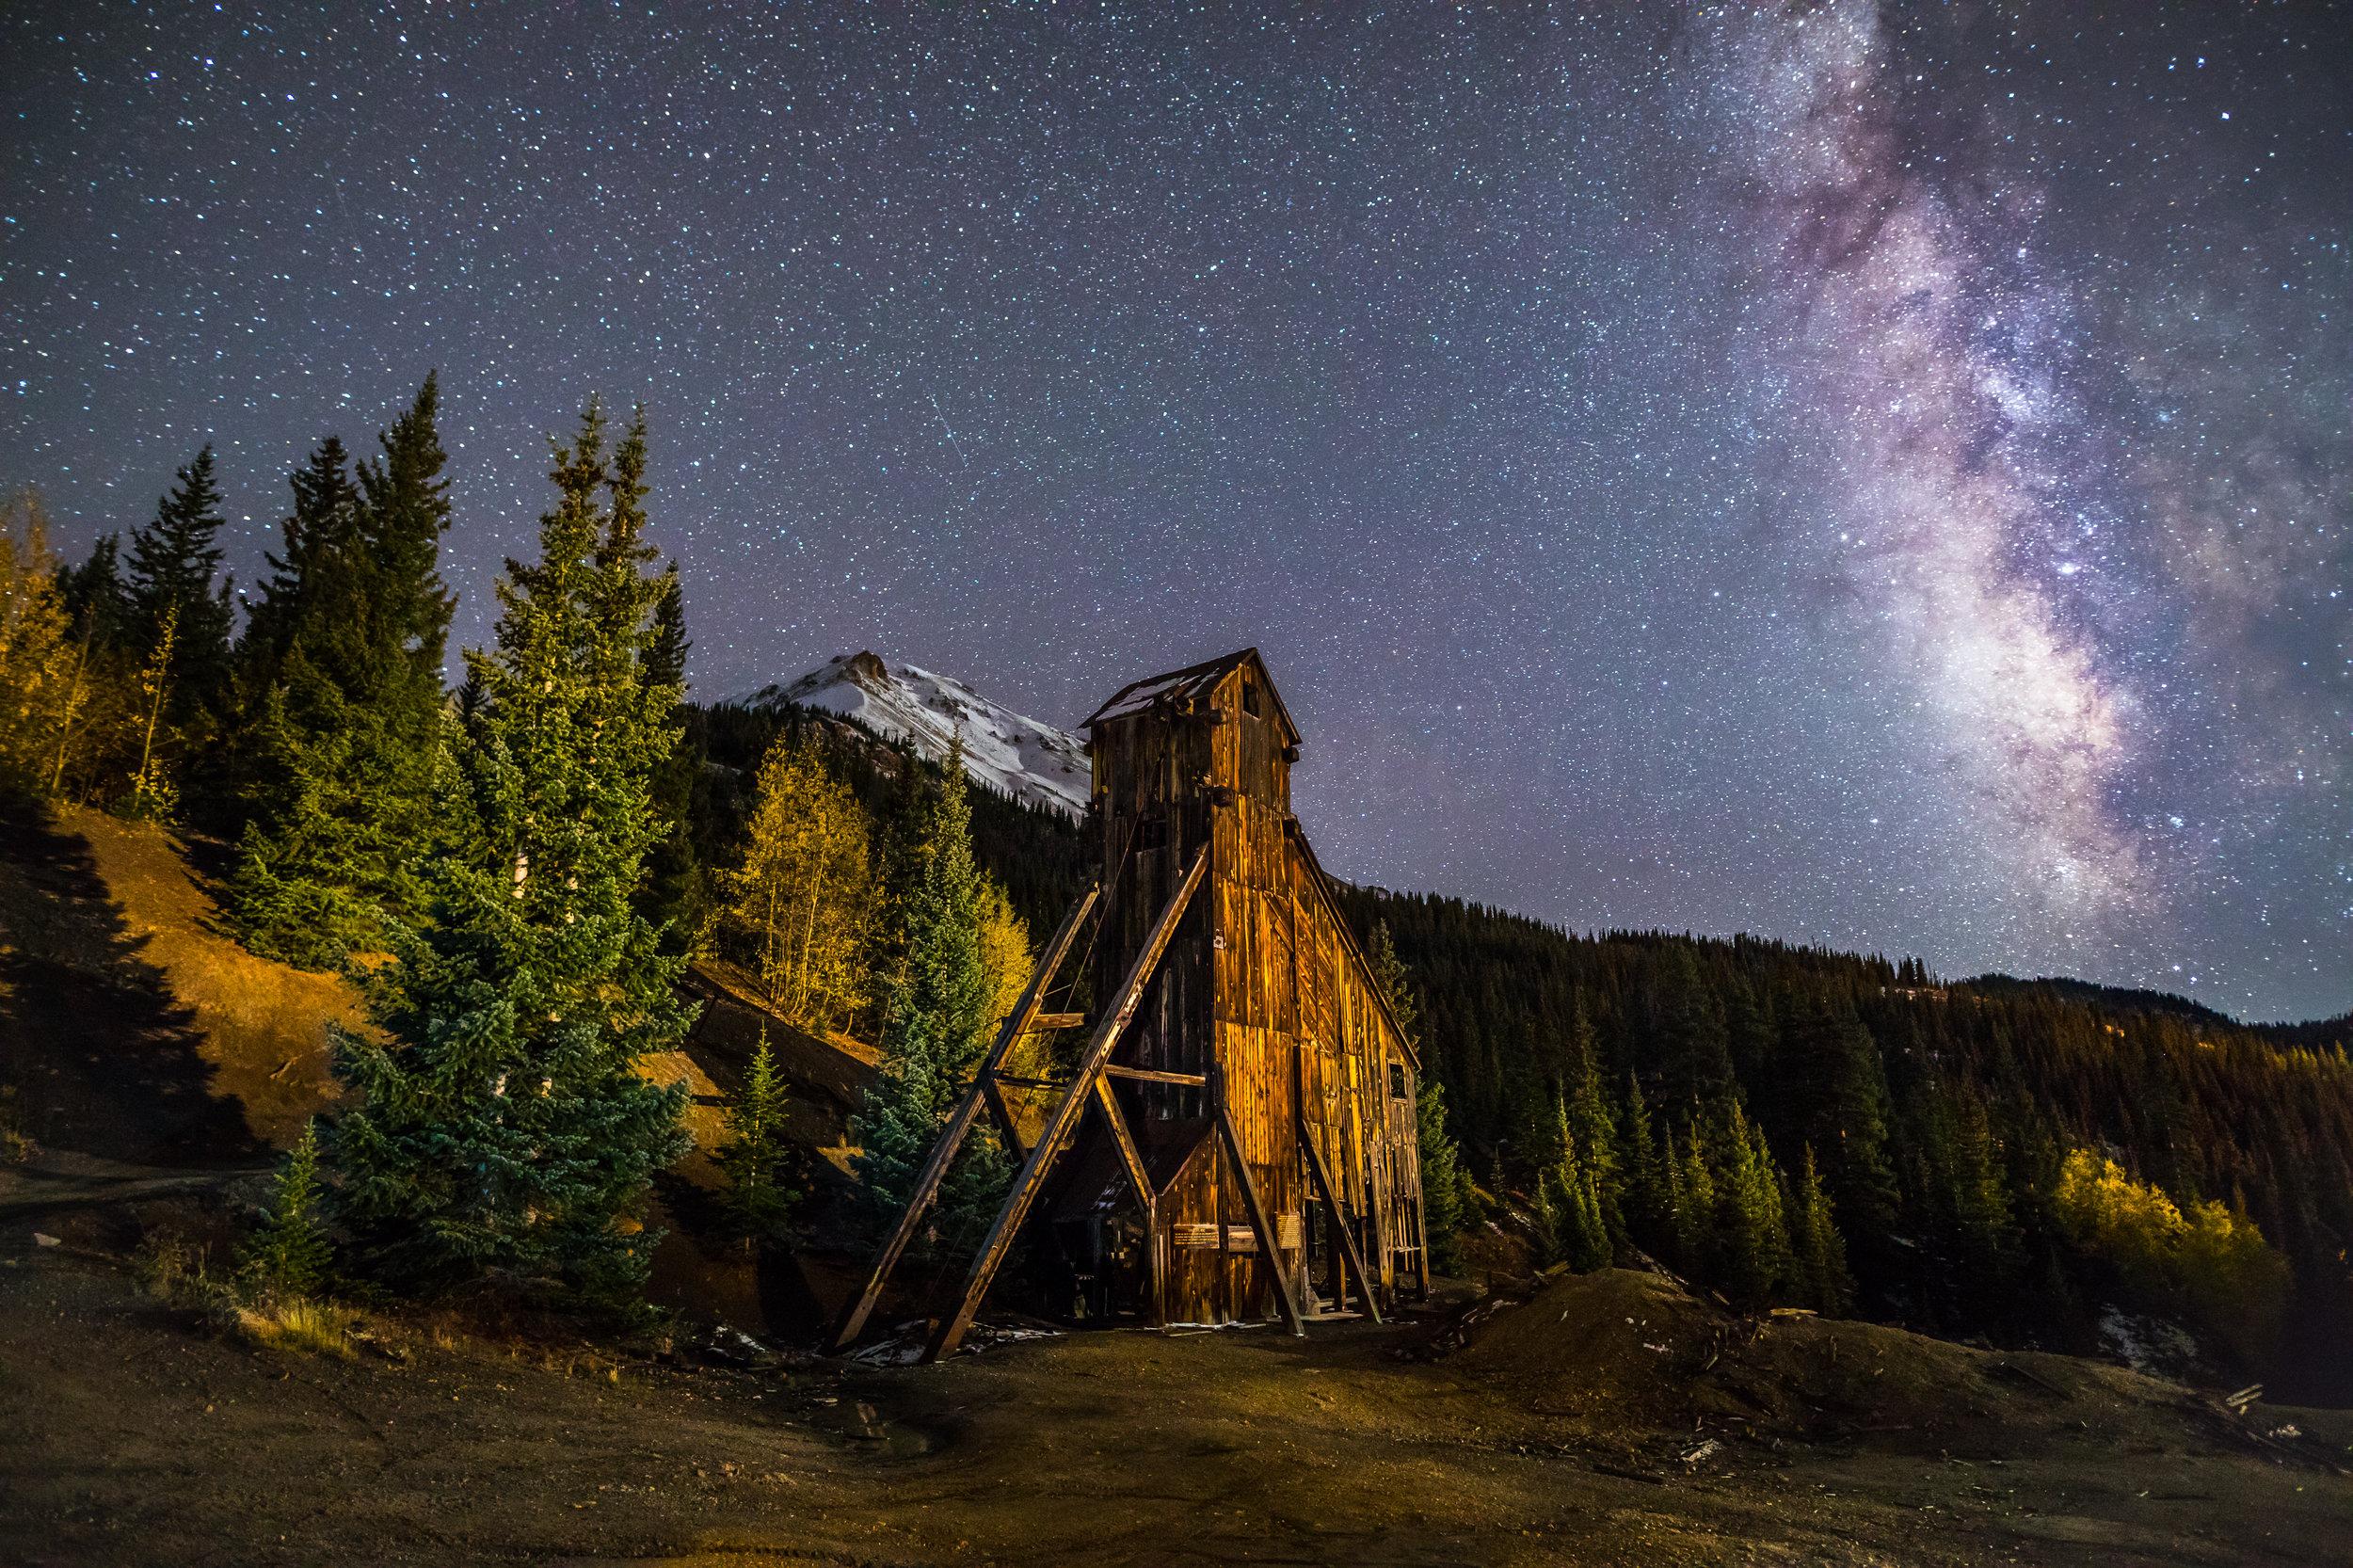 Milky way over Yankee Girl Mine, Image # 5474